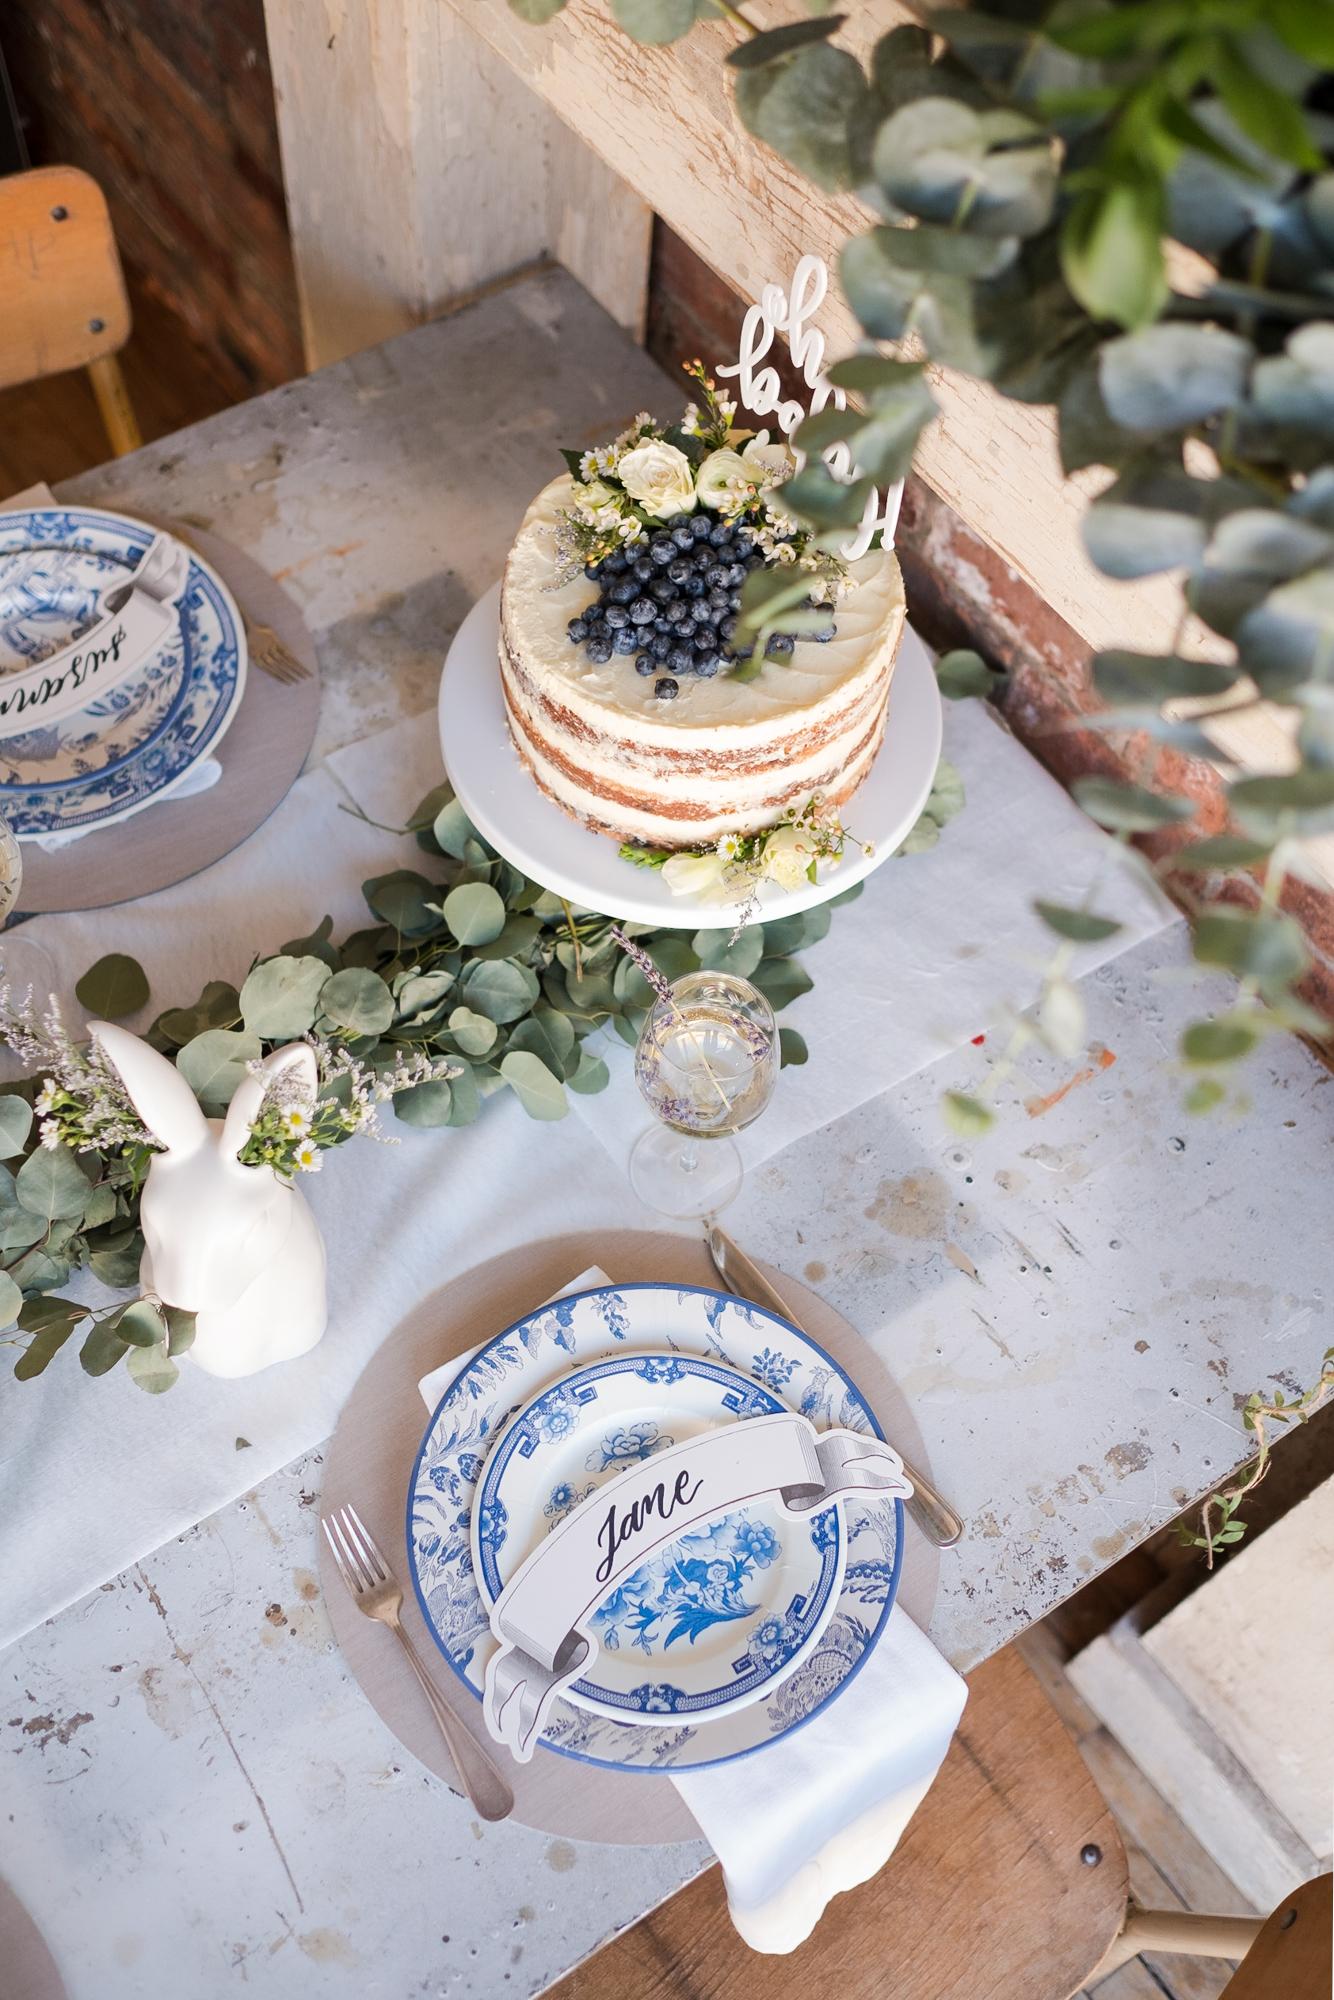 Caspari Blue and White Plates